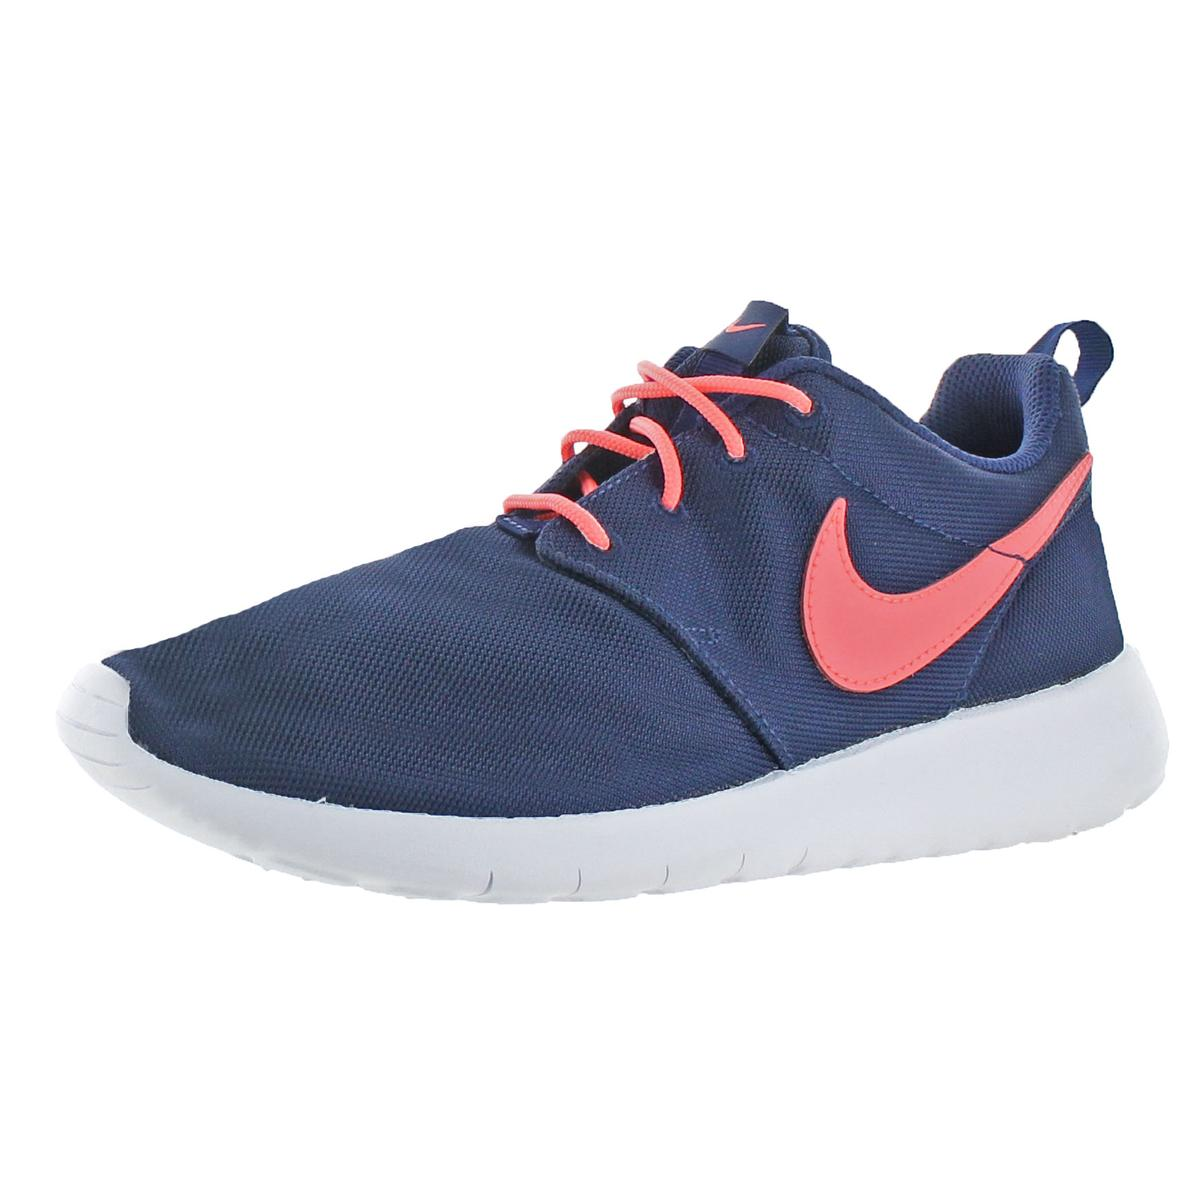 b2856468f685 Details about Nike Girls Roshe One Navy Running Shoes 6.5 Medium (B